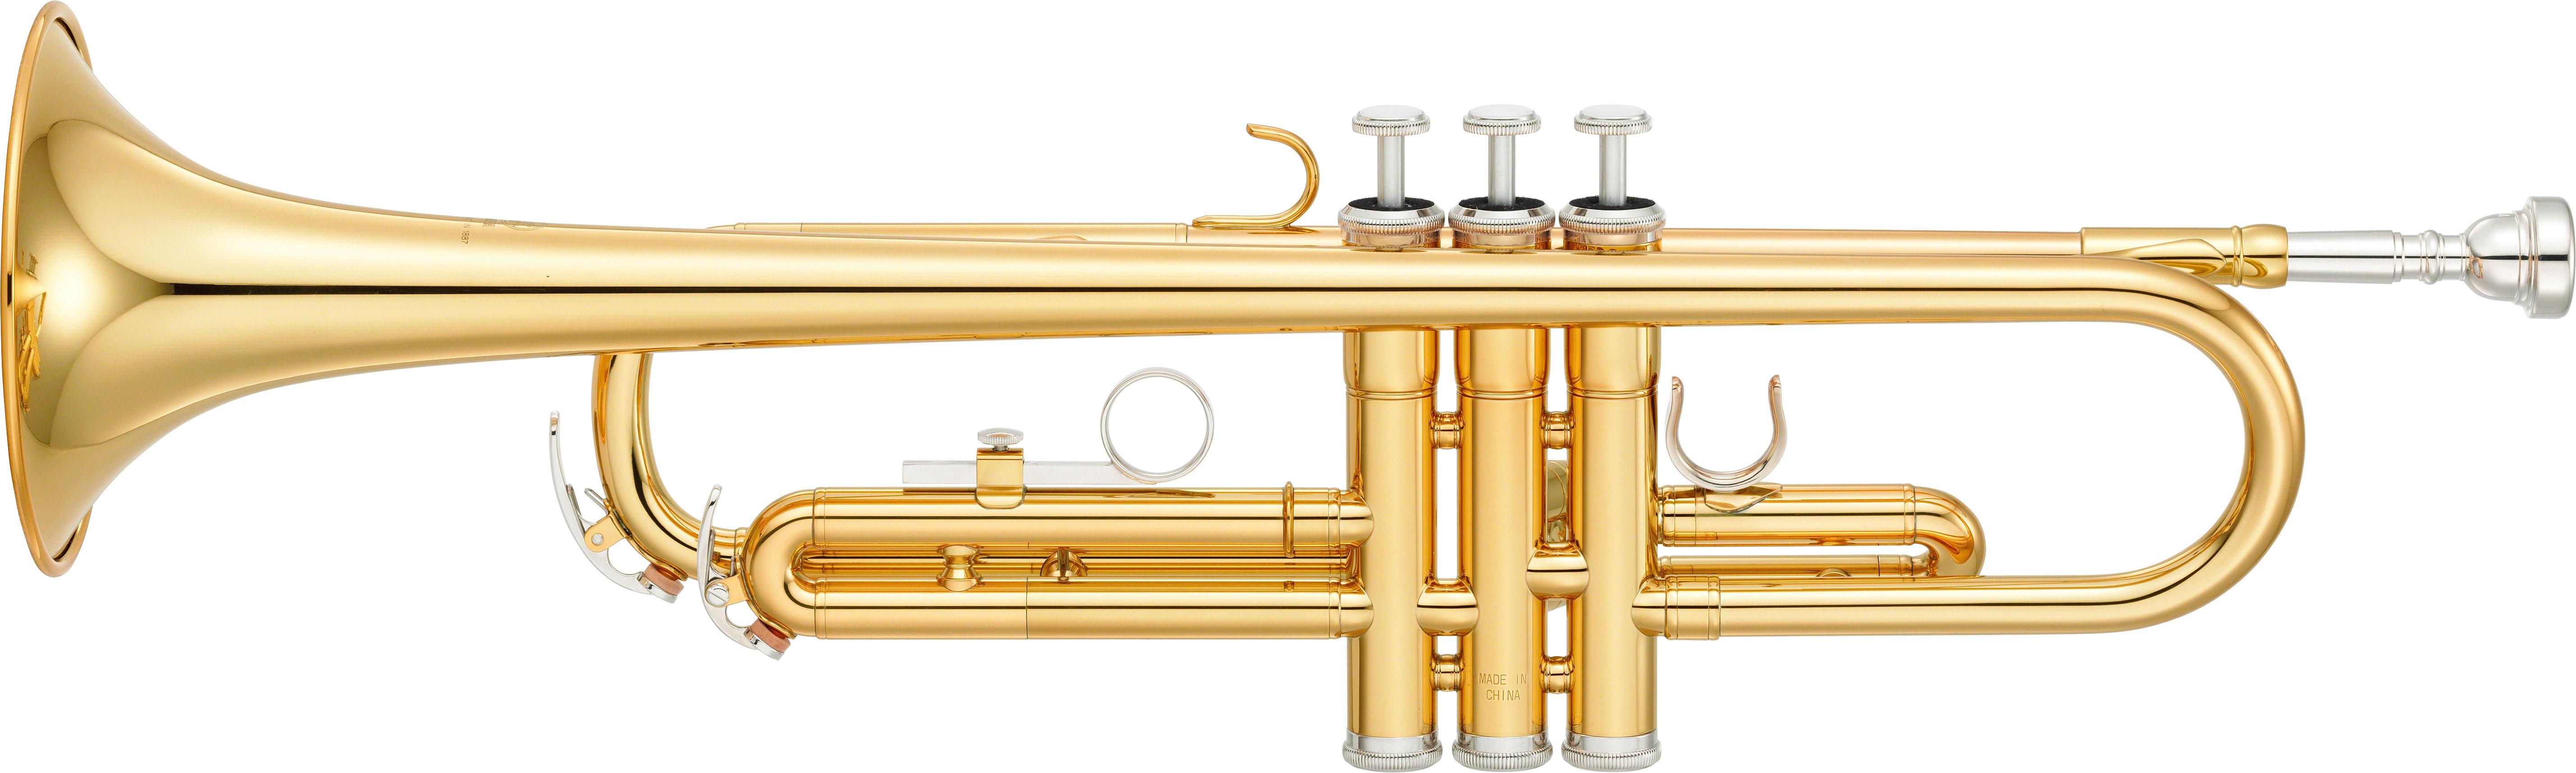 Yamaha Tr Trumpet